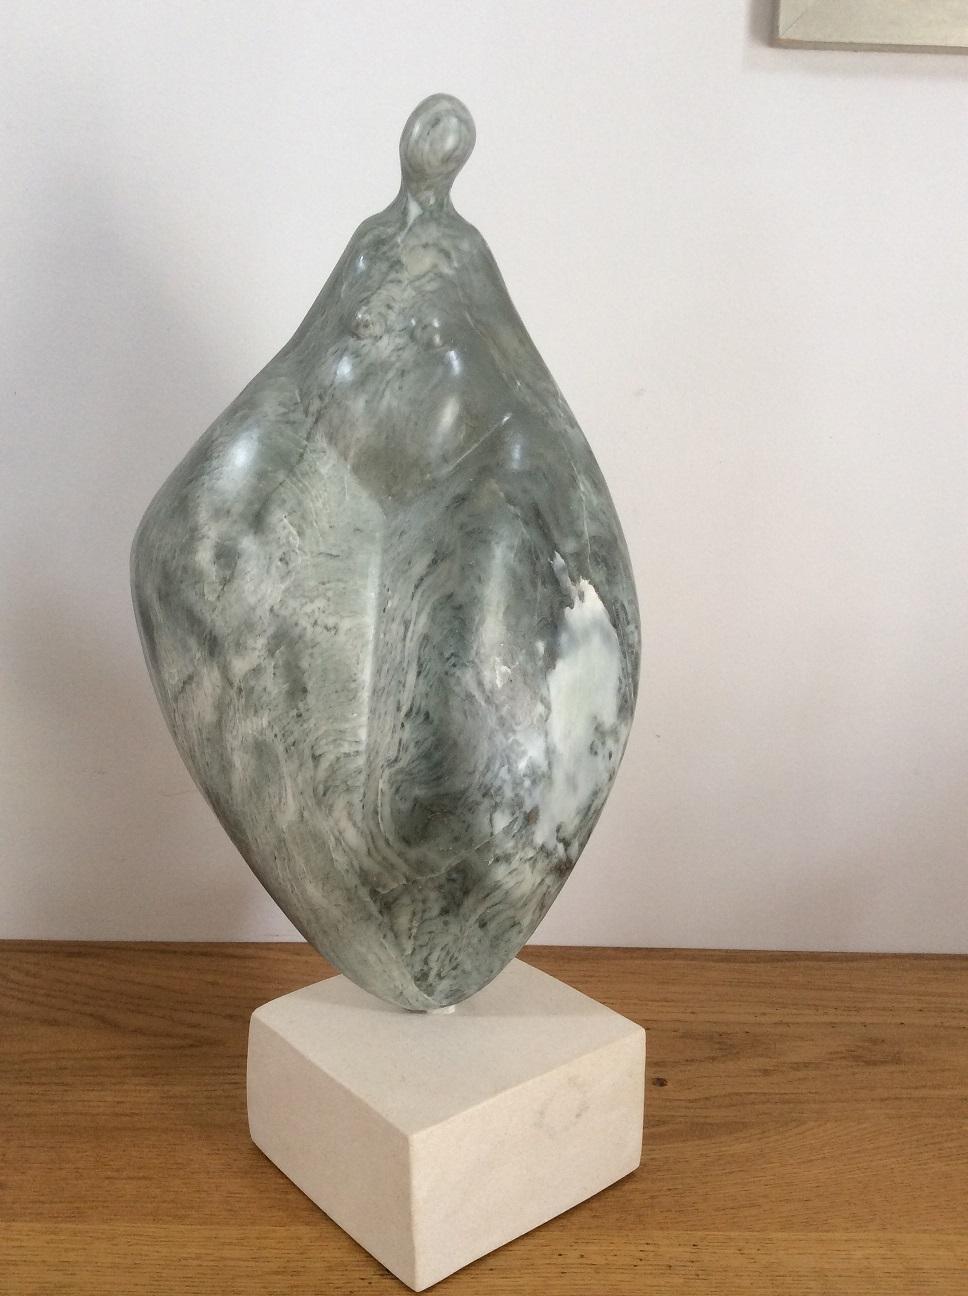 stéatite pierre a savon tendre verte sculpture femme calipige christine lambert